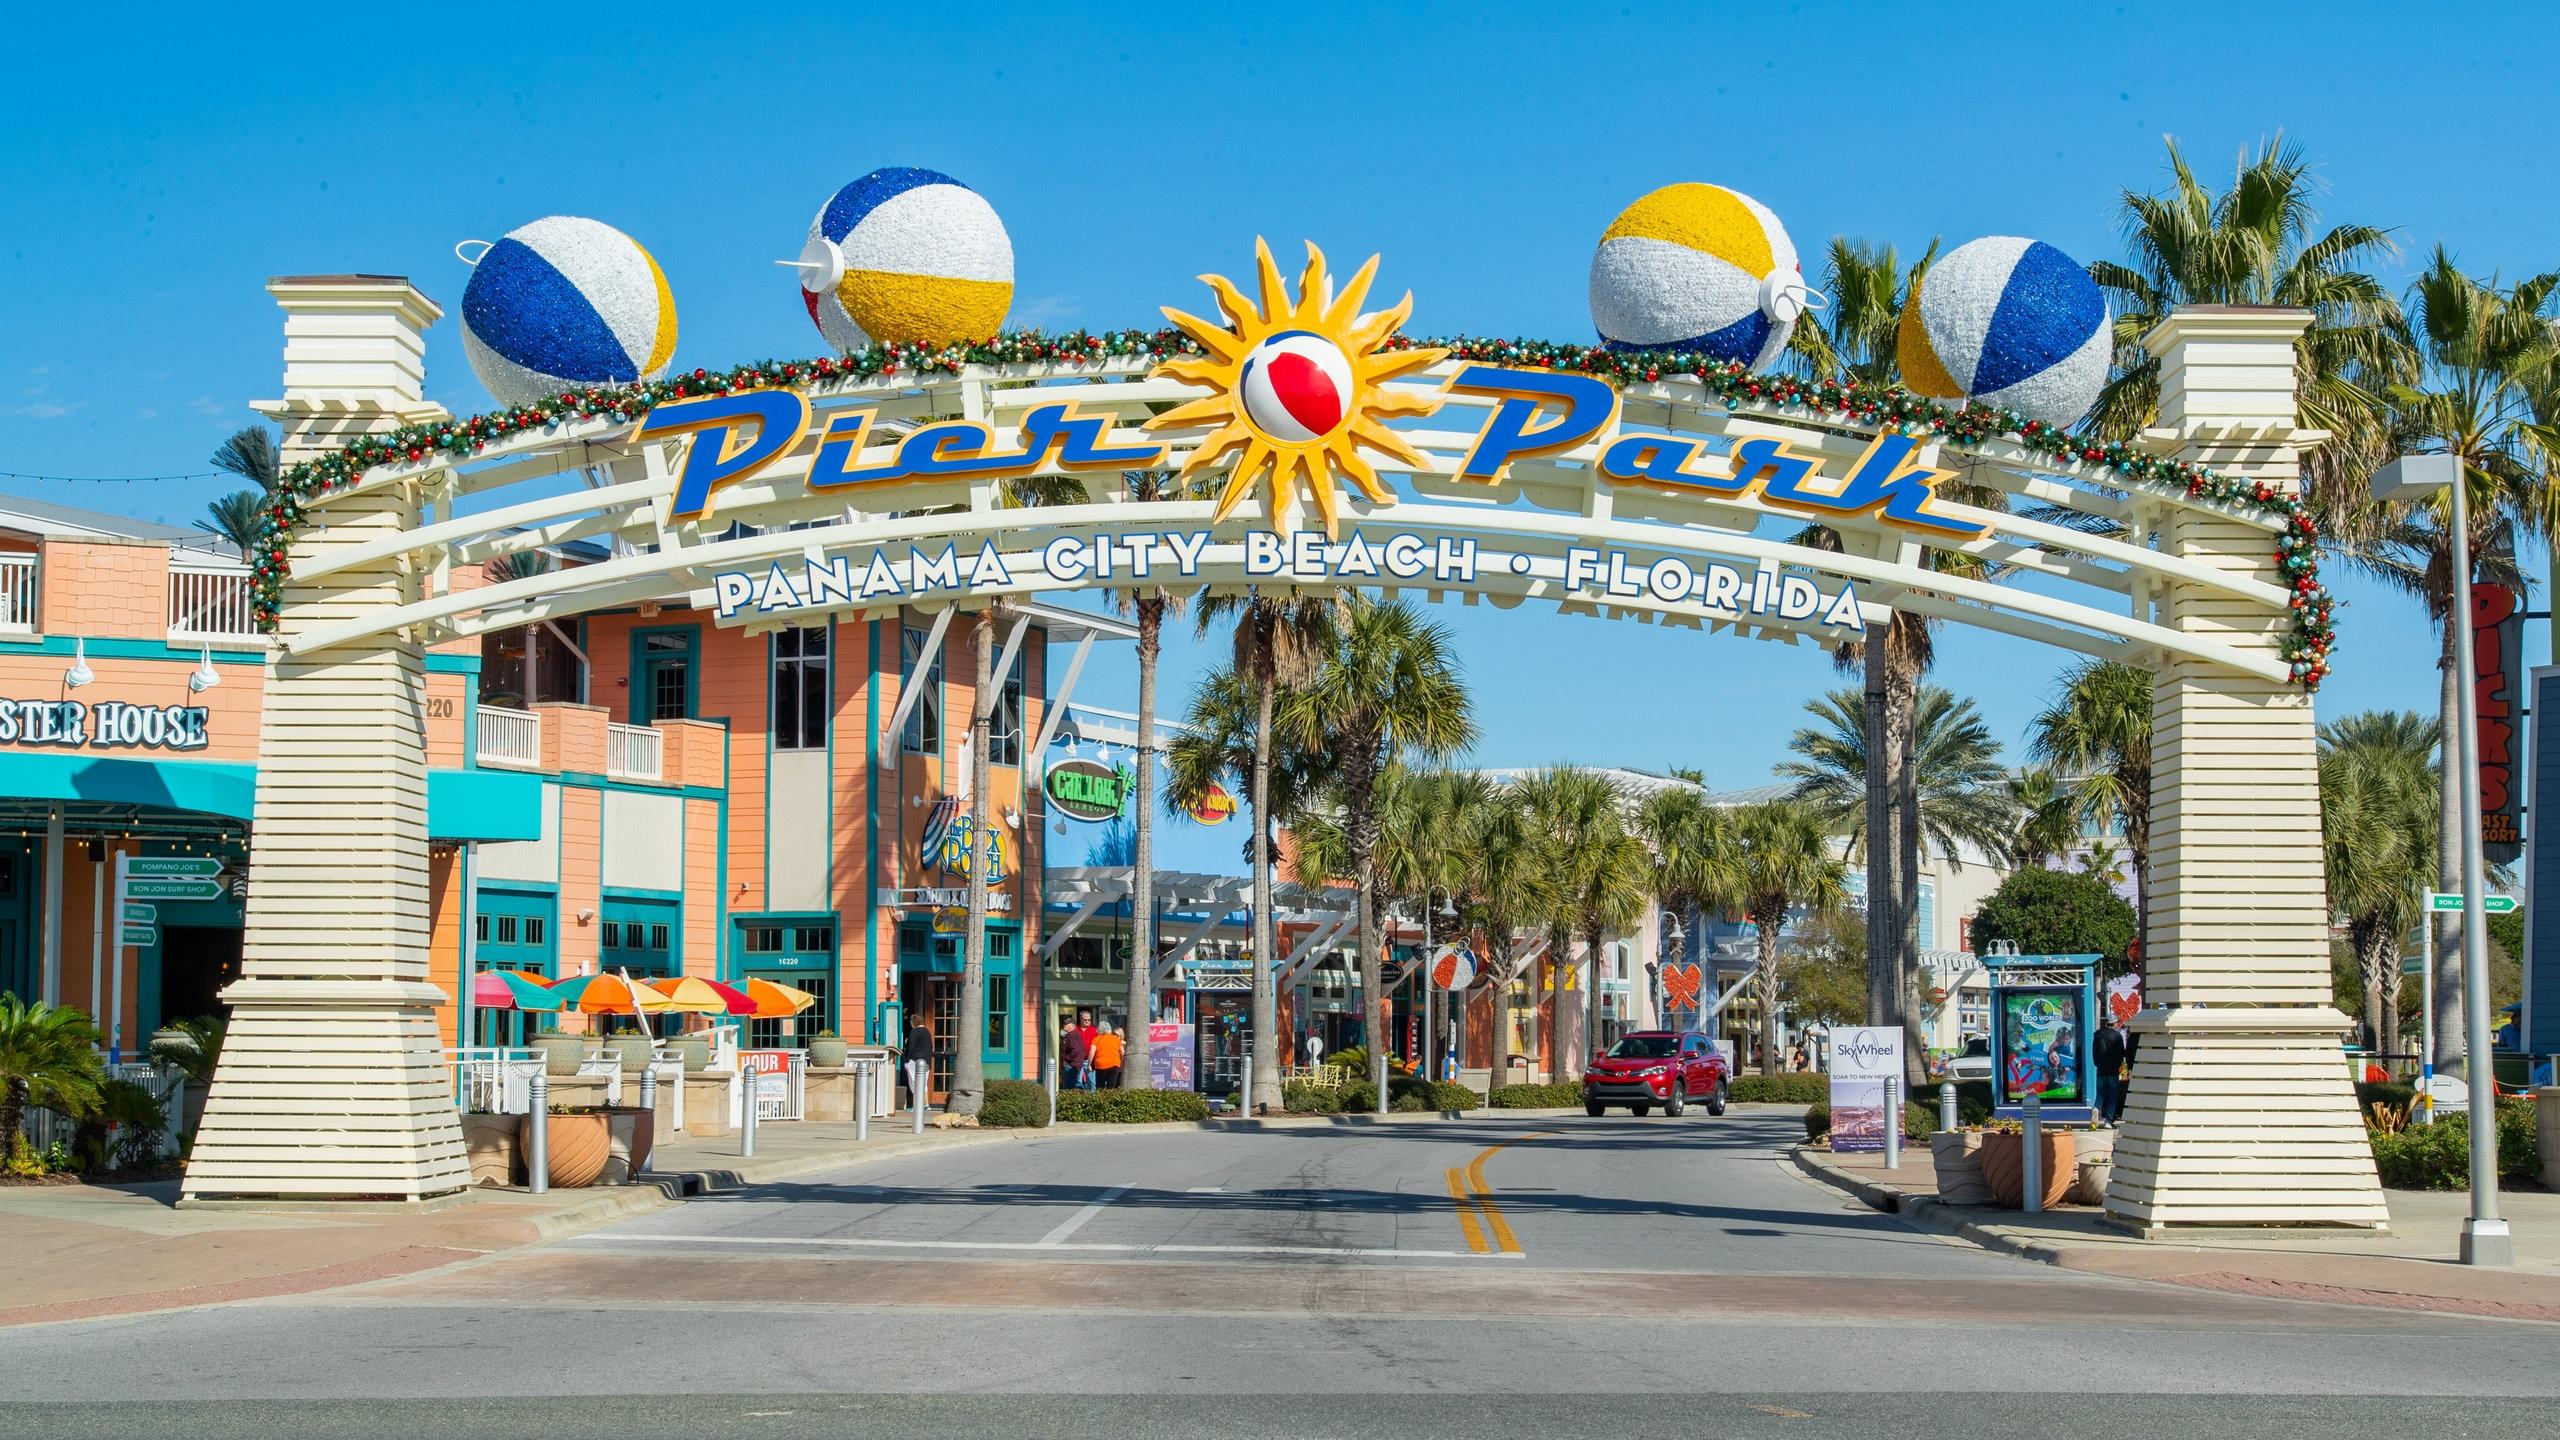 Pier Park, Panama City Beach, Florida, USA